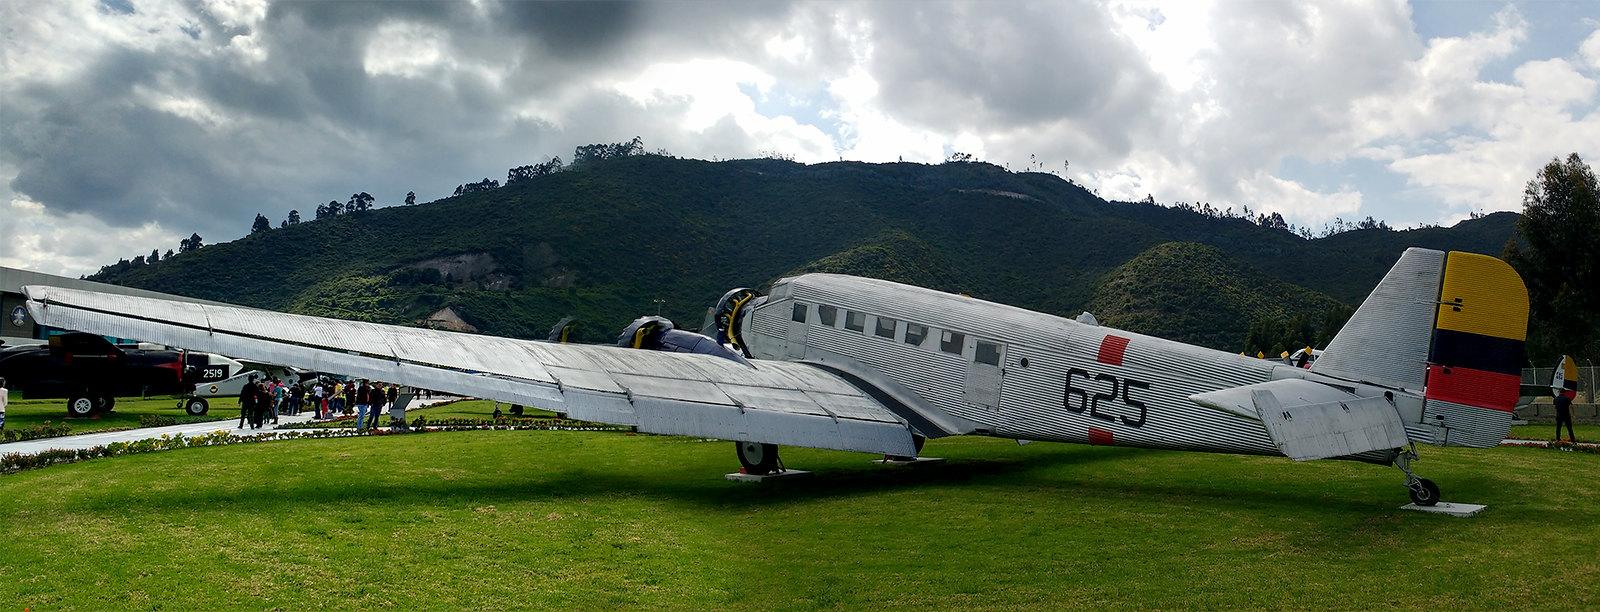 03a. Junkers-Ju-52-3m